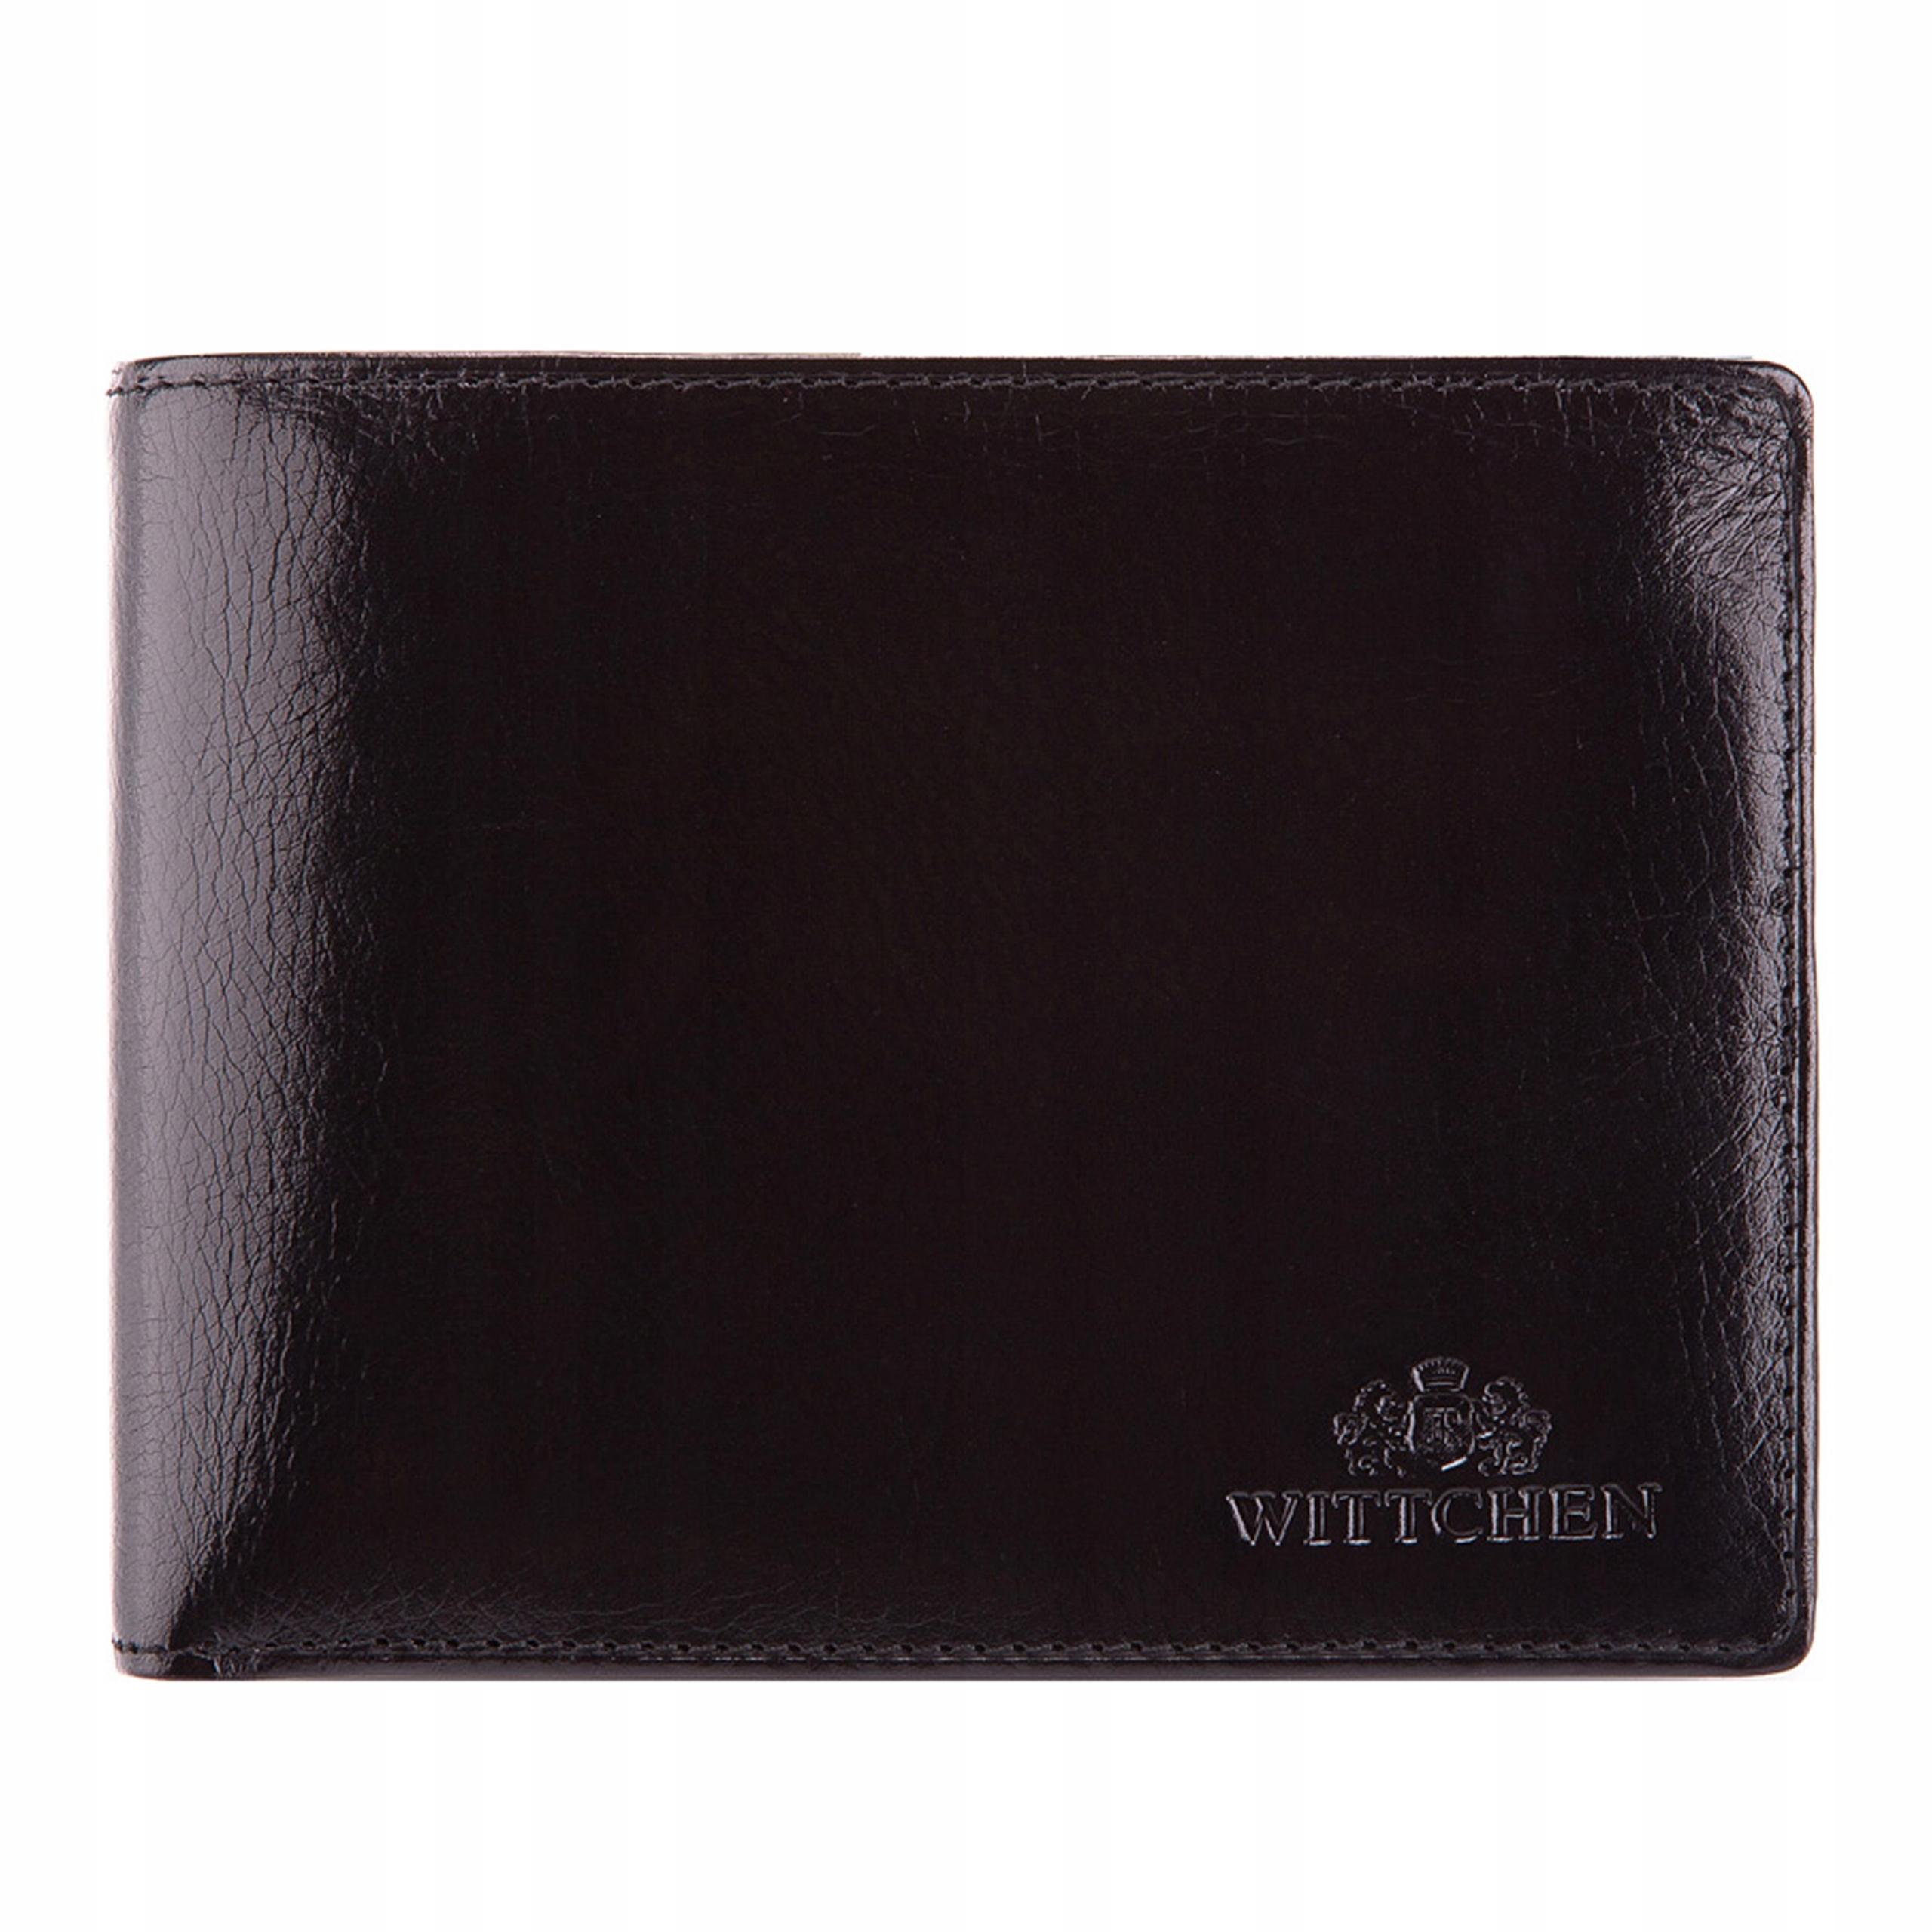 a1df783c1034f Portfel Wittchen męski Italy 21-1-039 średni skóra 7661186504 - Allegro.pl